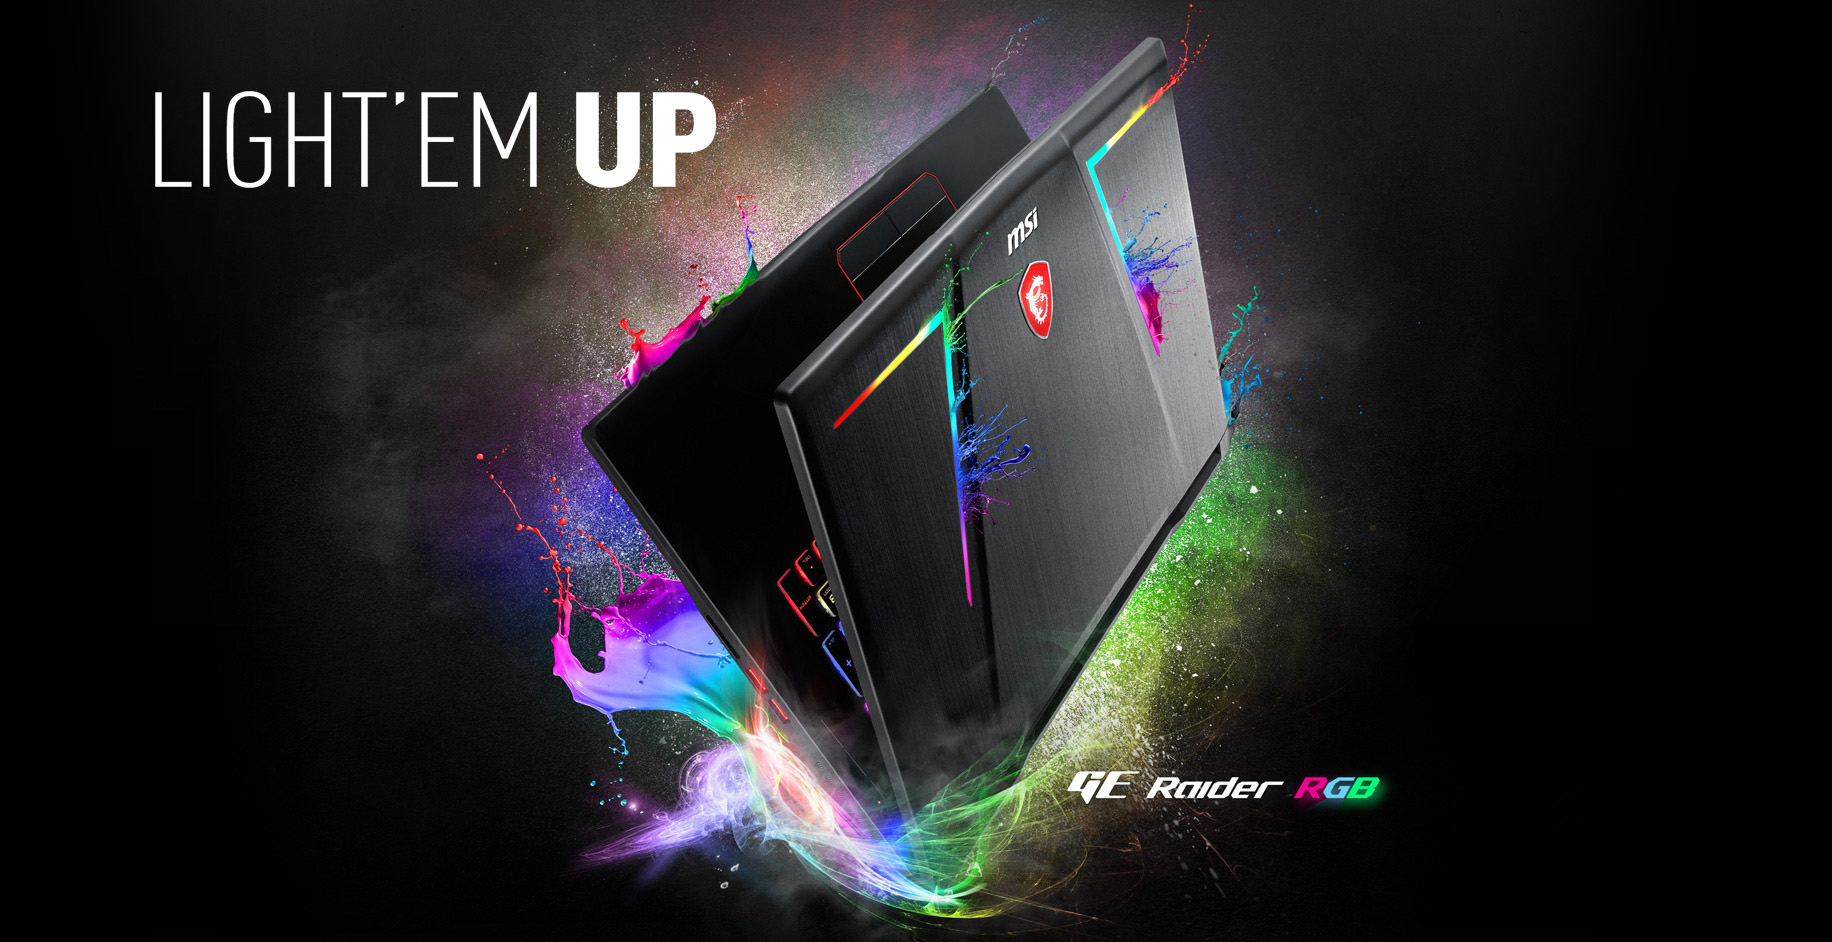 Laptop MSI GE63 8RE-266VNi7-8750H / 16GB/1TB 7200rpm + 128GB SSD/GTX1060/6GB